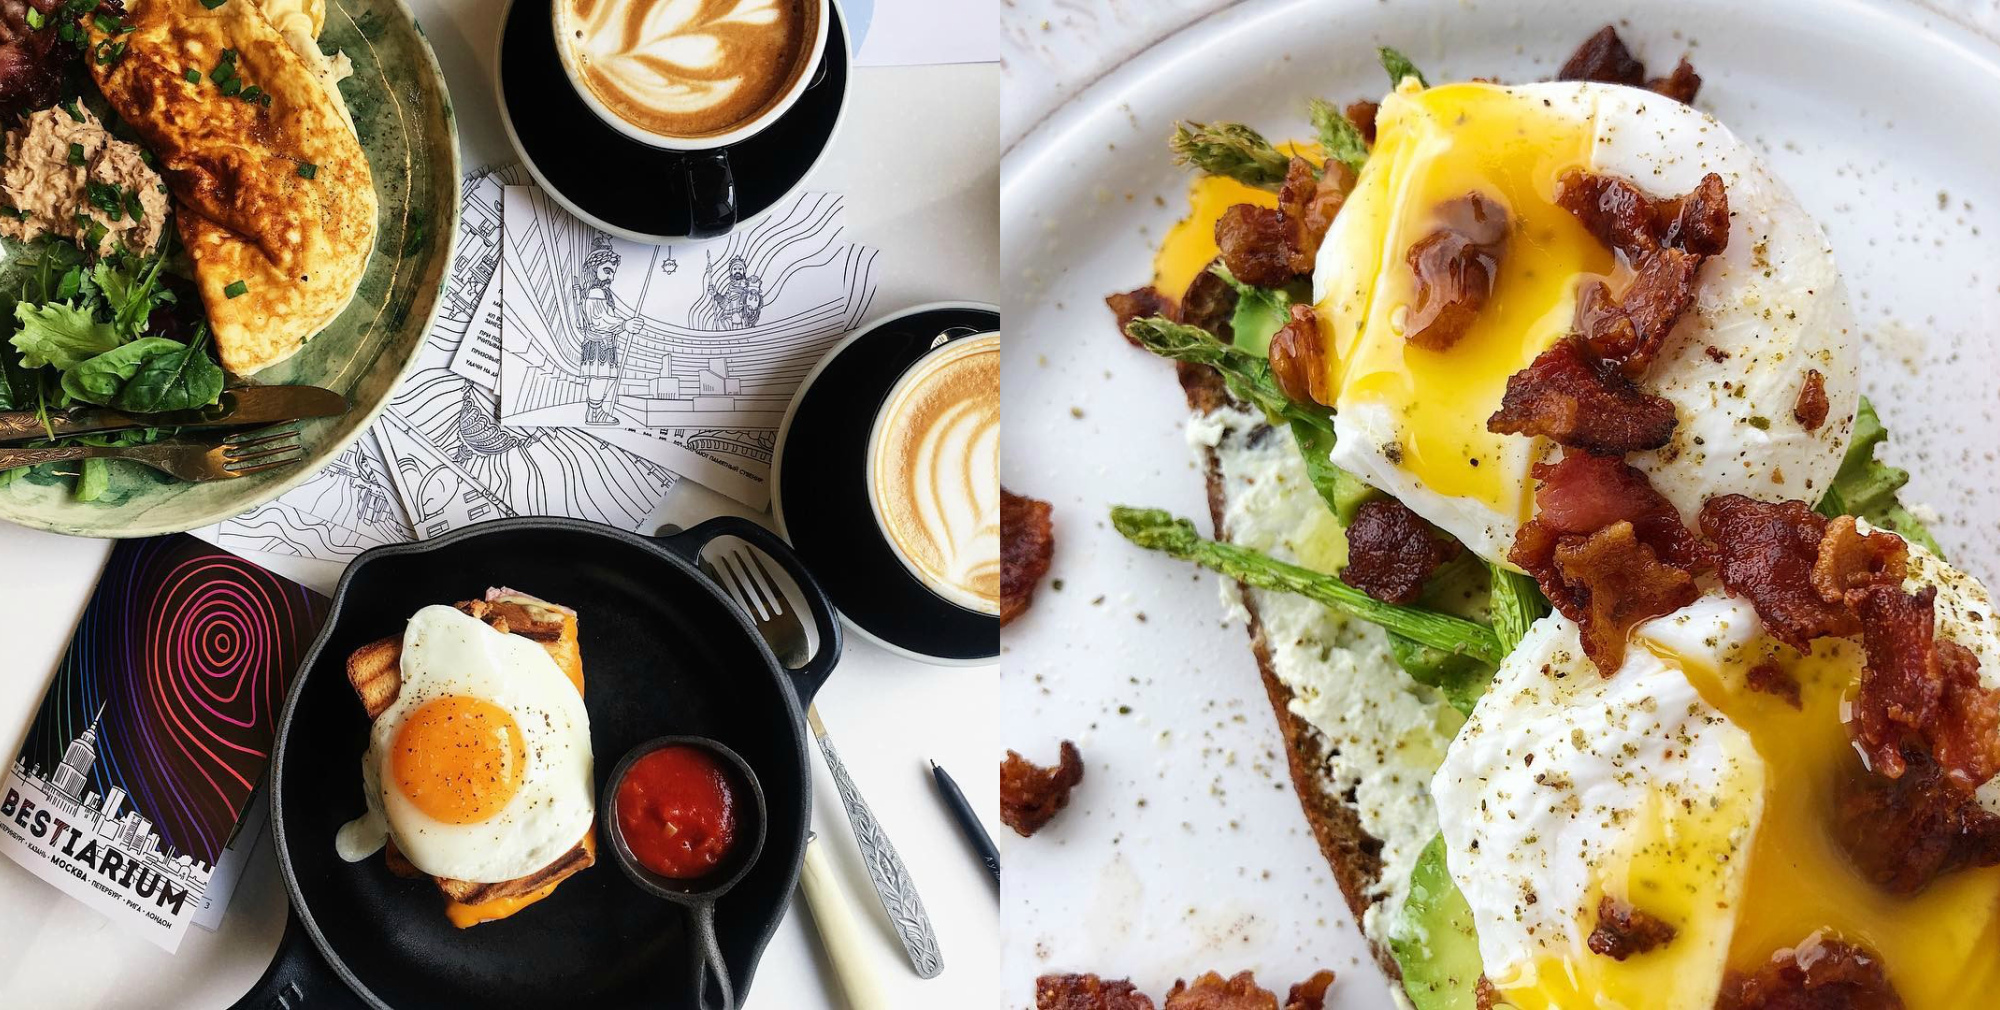 Девушки и их проекты: Света и Полина о завтраках Eggsellent